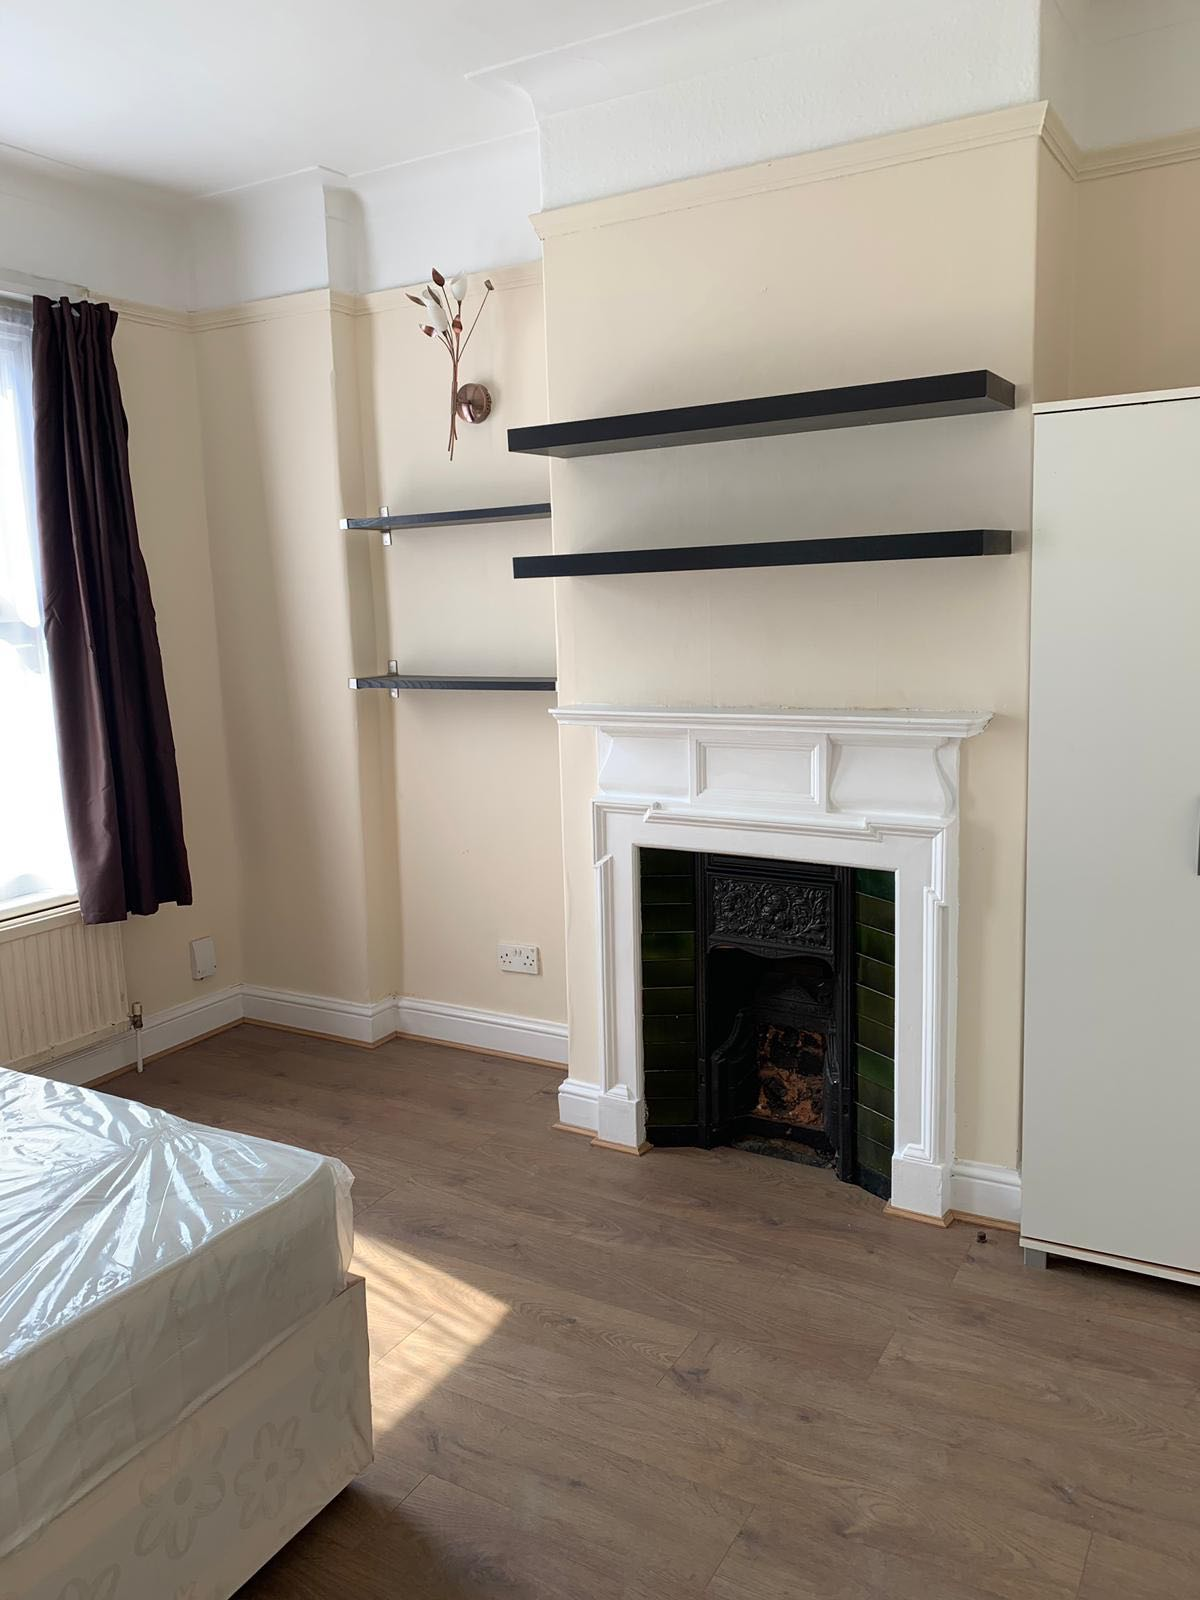 1 room in Woodside, London, N22 6LD RoomsLocal image